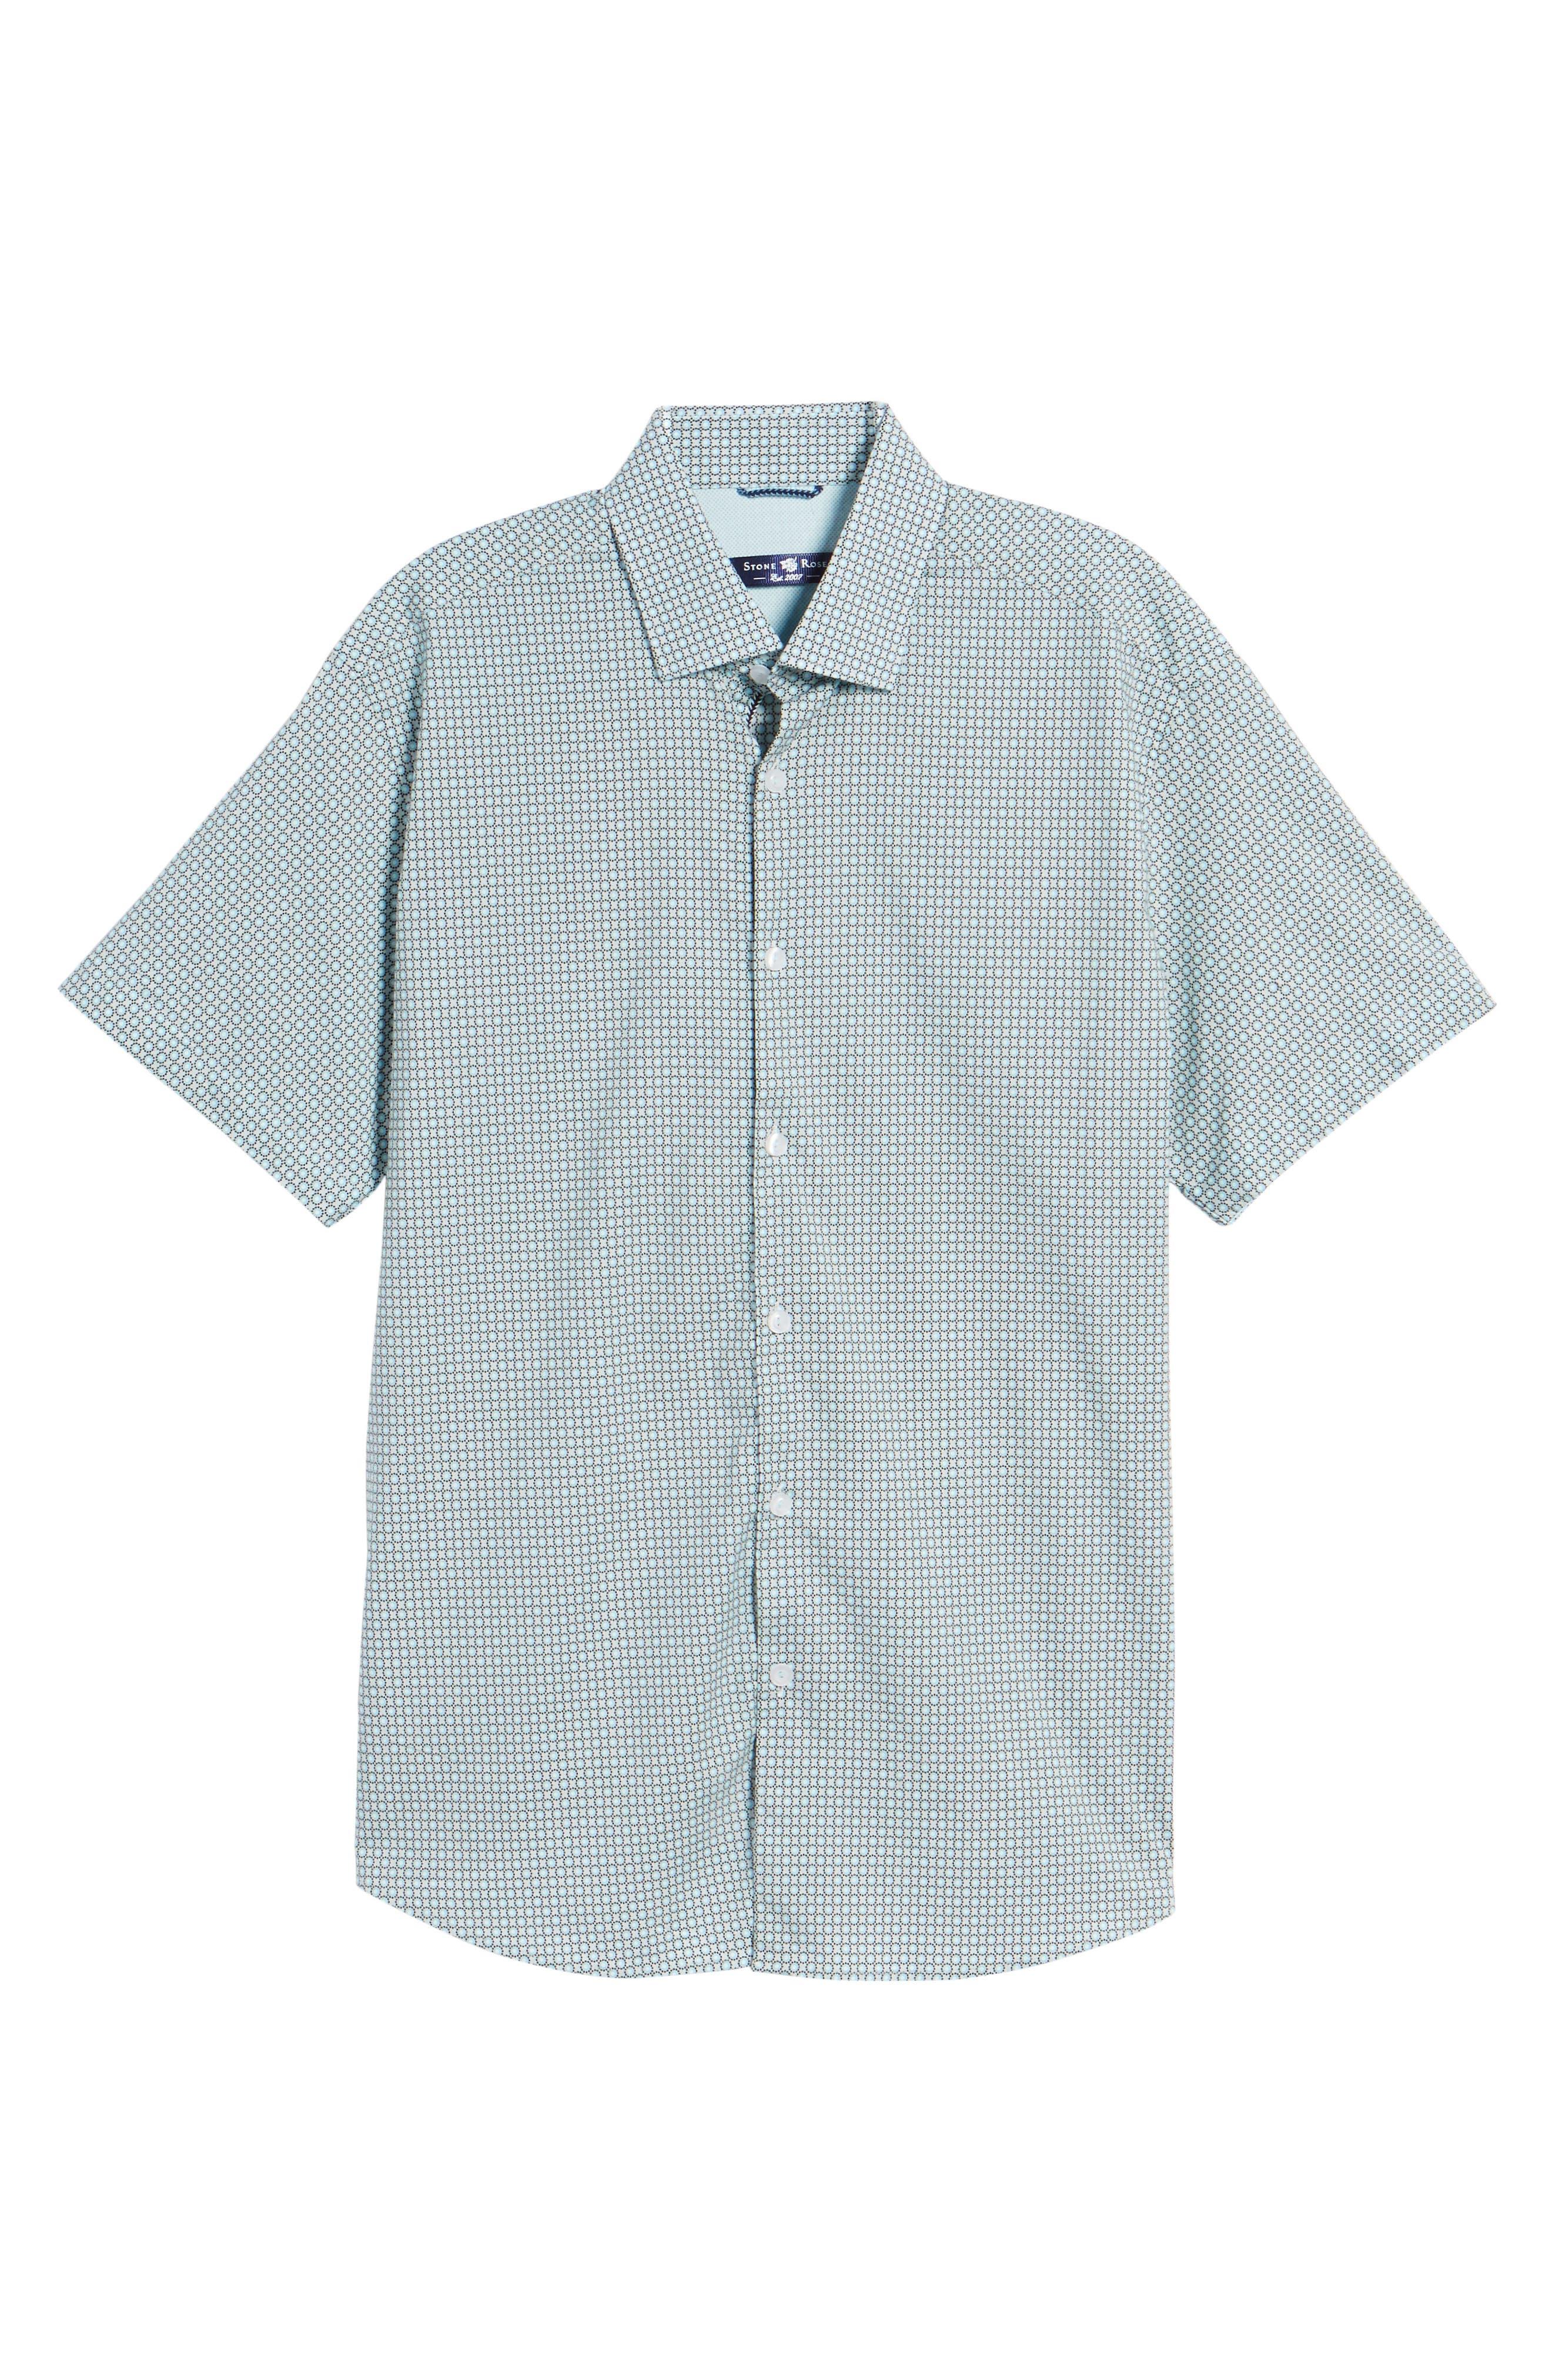 Woven Sport Shirt,                             Alternate thumbnail 6, color,                             020